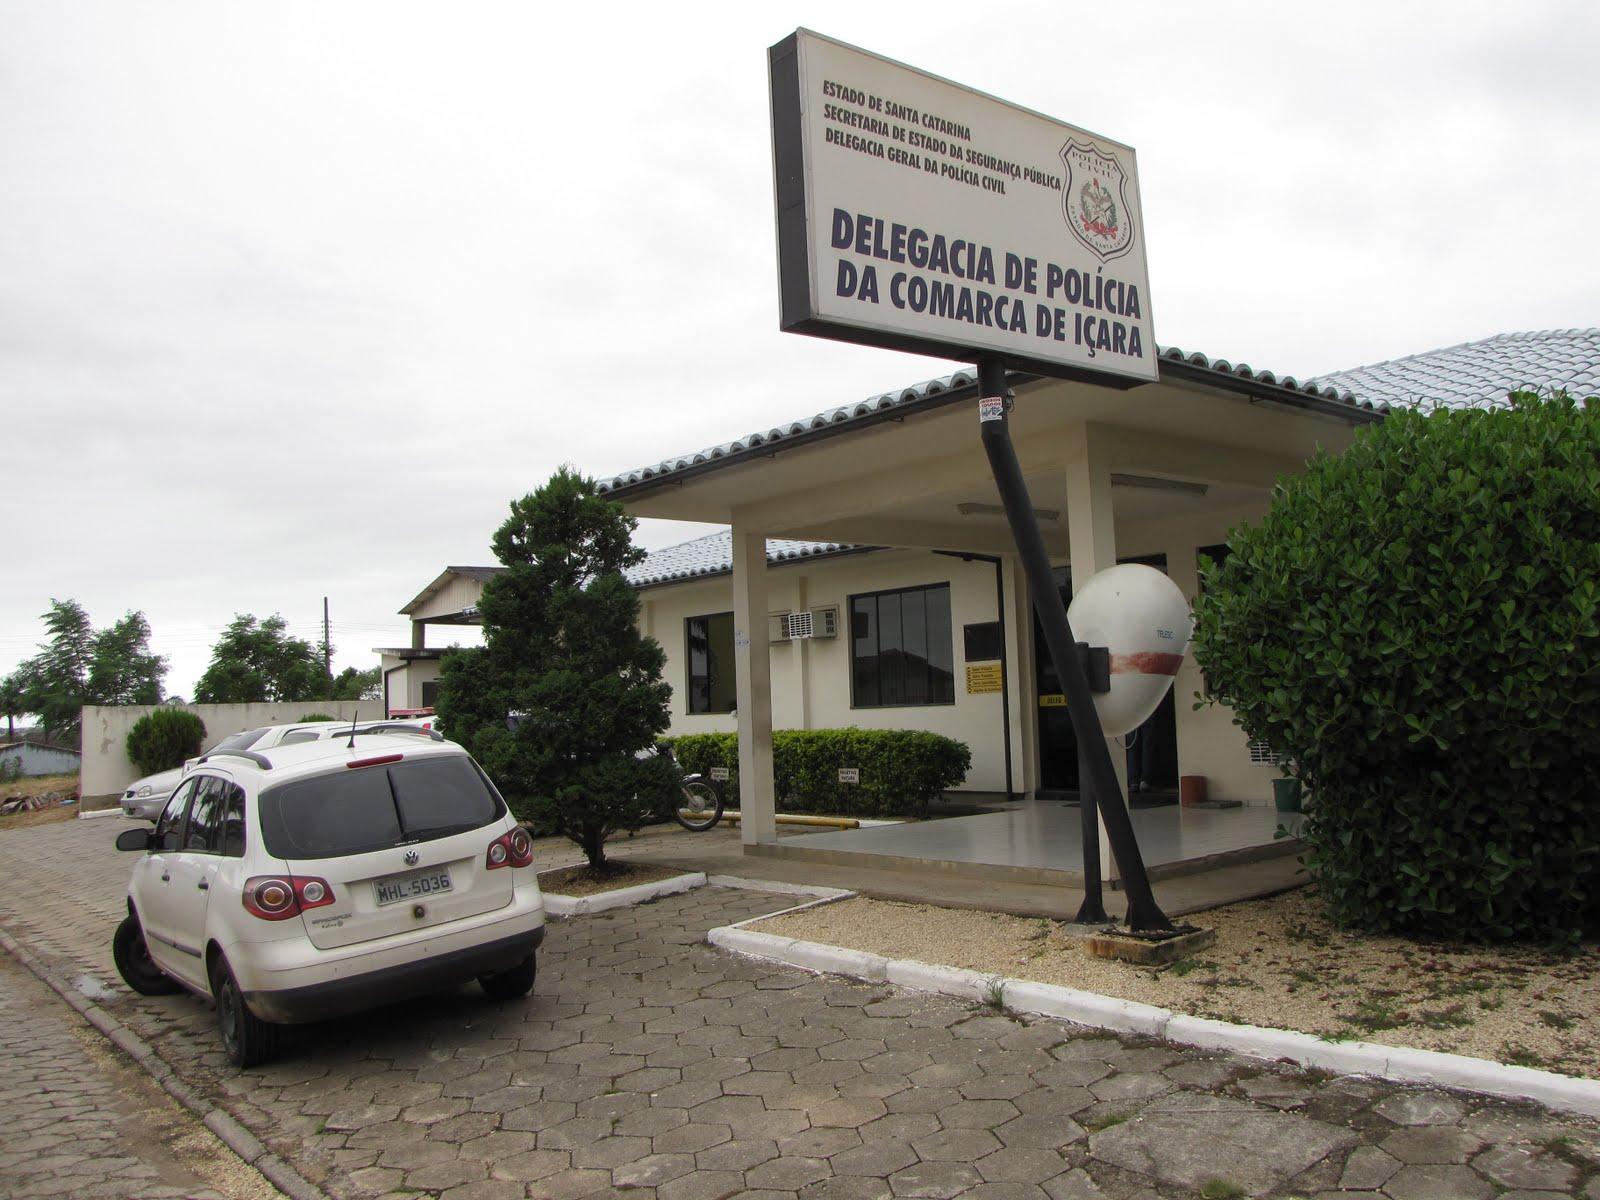 Polícia Militar é preso por tentativa de feminicídio no Bairro Raichaski